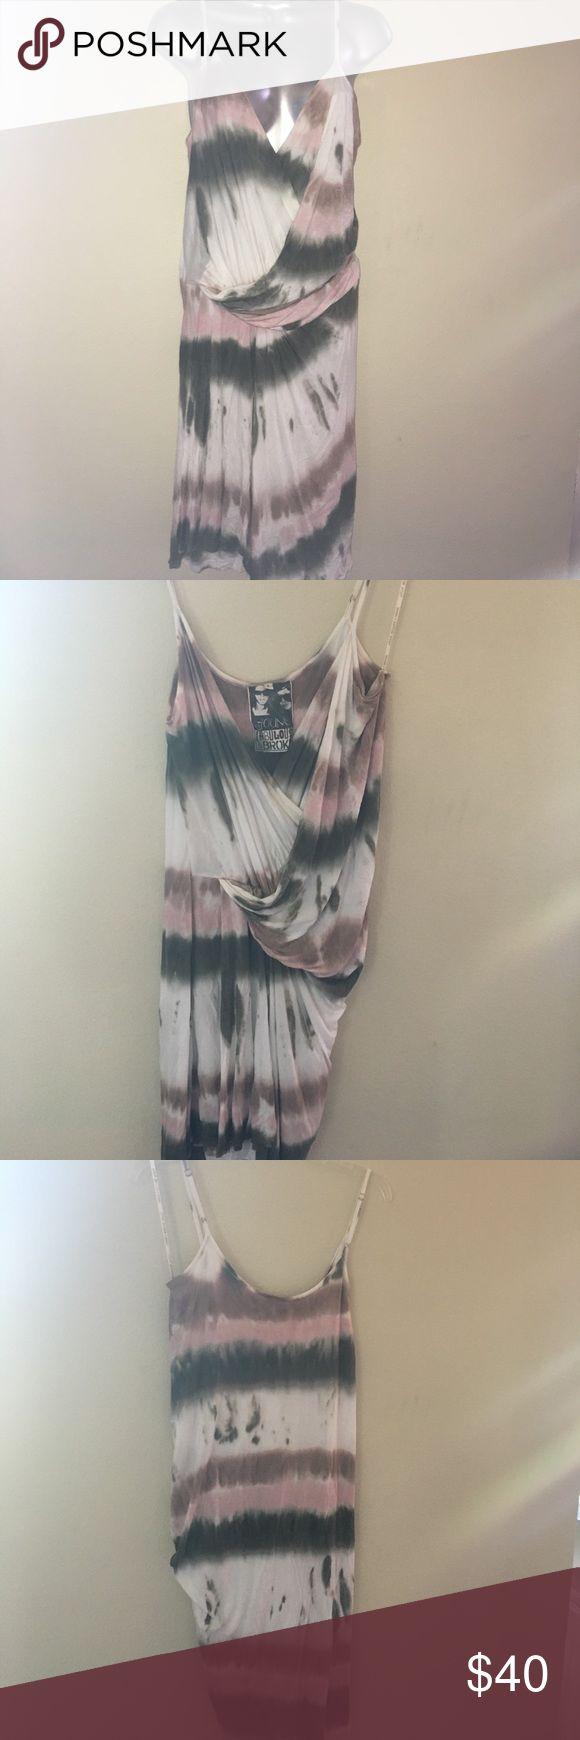 Young Fabulous and Broke Kulani Tie Dye Dress Lrg Tie Dye Multi Color short dress (rose, brown, cream, olive & white).                                 A2 Young Fabulous & Broke Dresses Midi